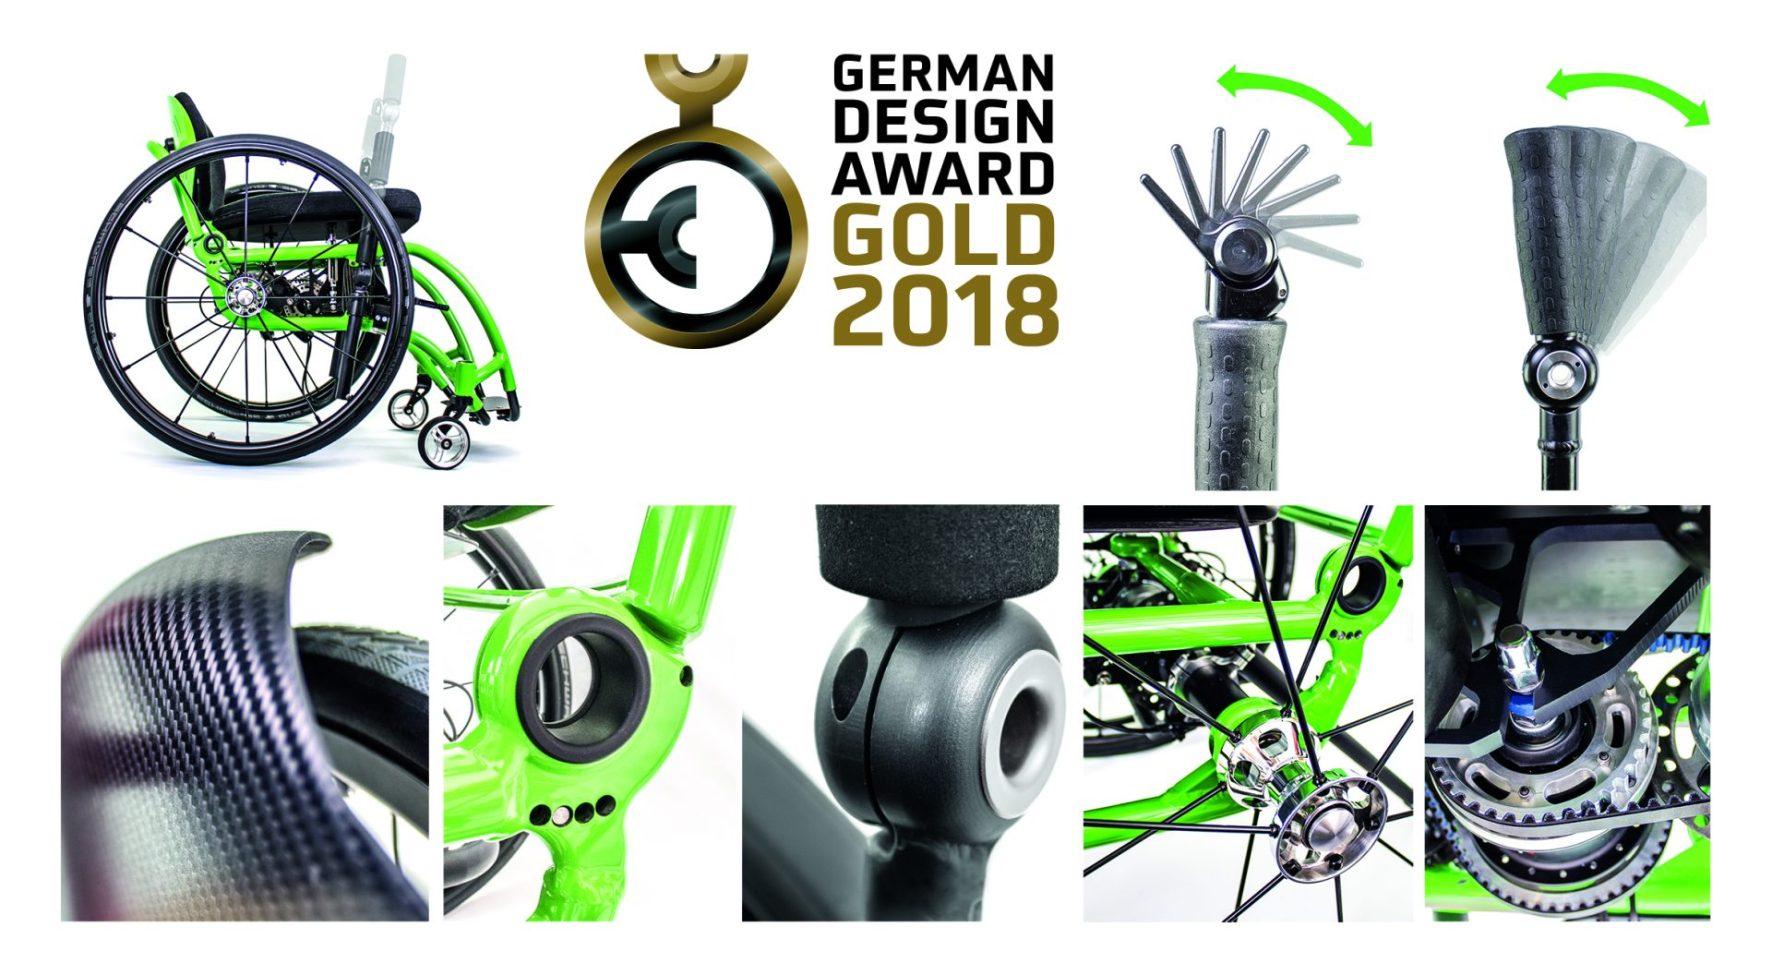 German Design Award Gold 2018 Gewinner – Foto: DESINO GmbH / TRD Mobil